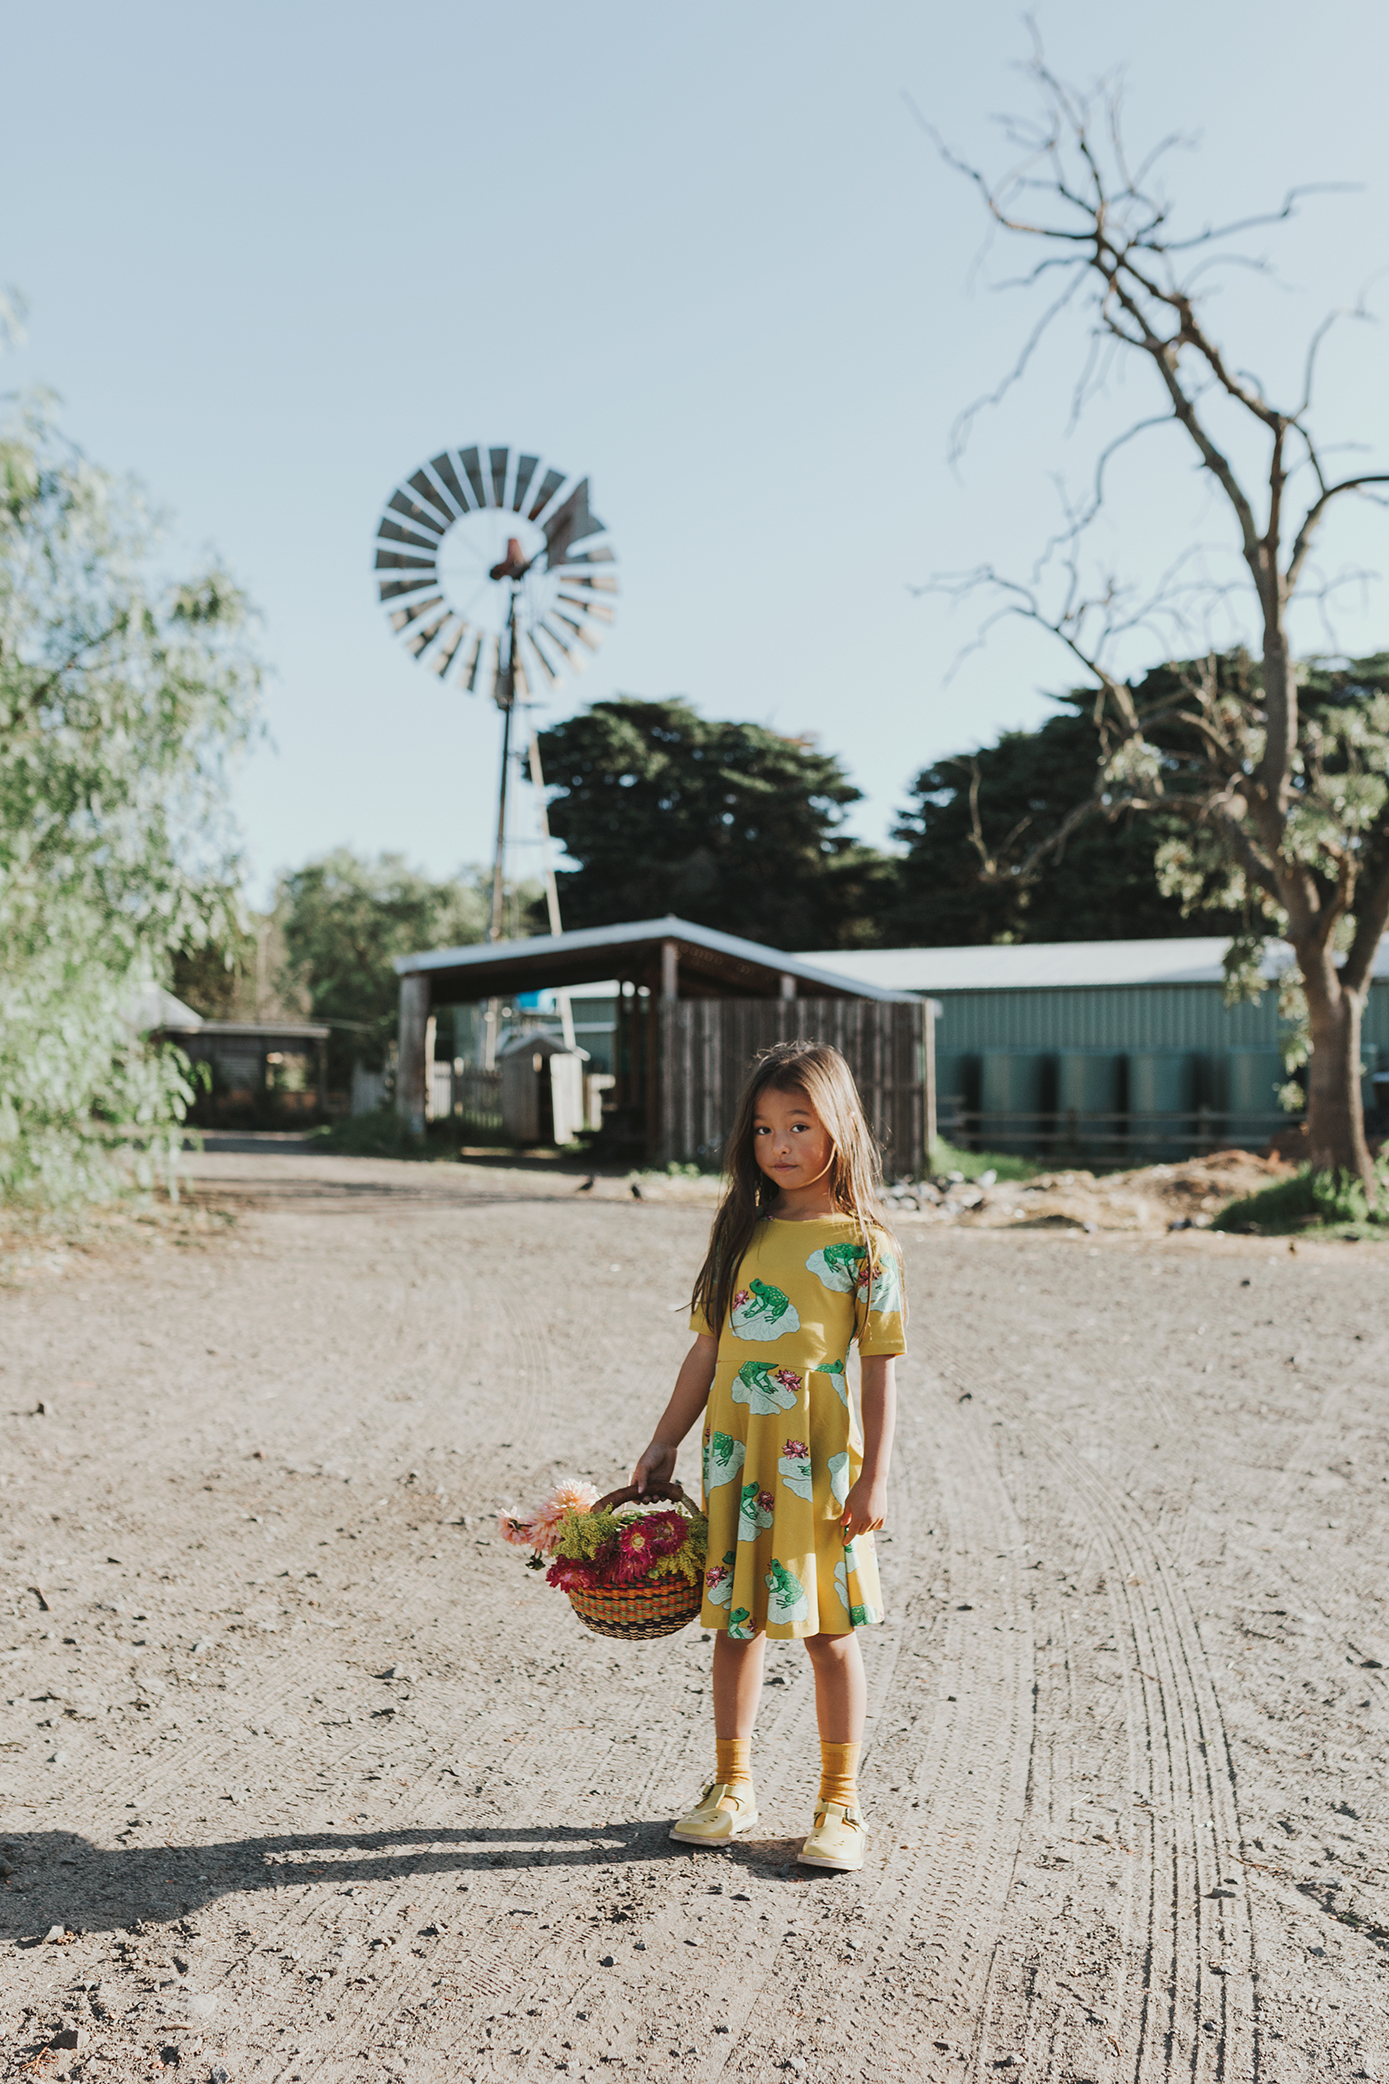 girl-basket-flowers-commercial-photographer-siida-tasmania.jpg